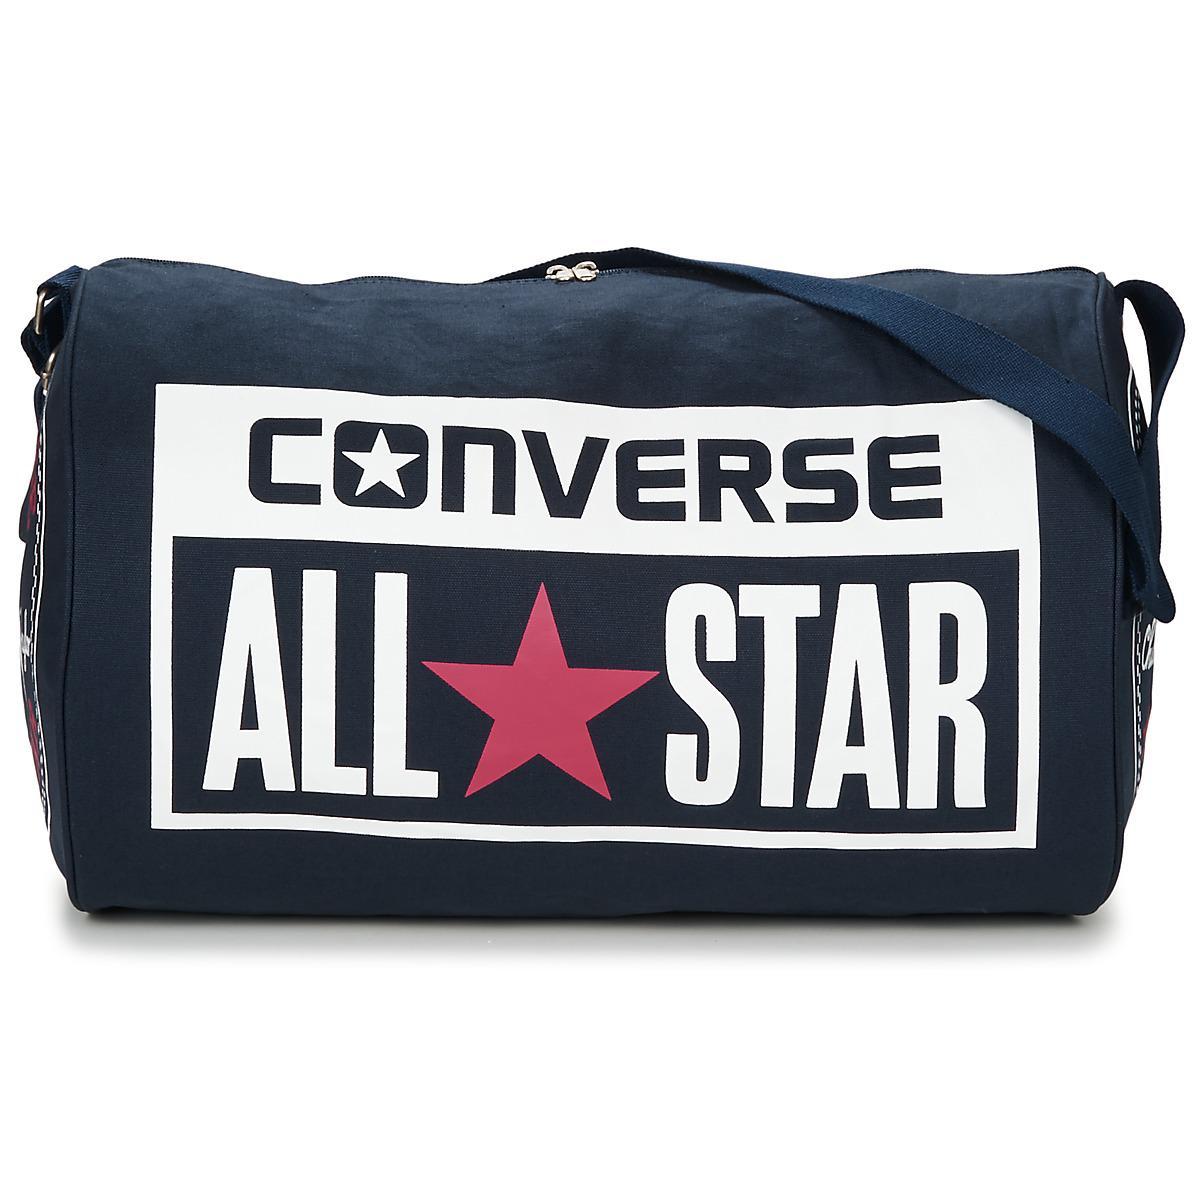 0412a6cead6 Converse Legacy Barrel Duffel Bag Women's Sports Bag In Blue in Blue ...